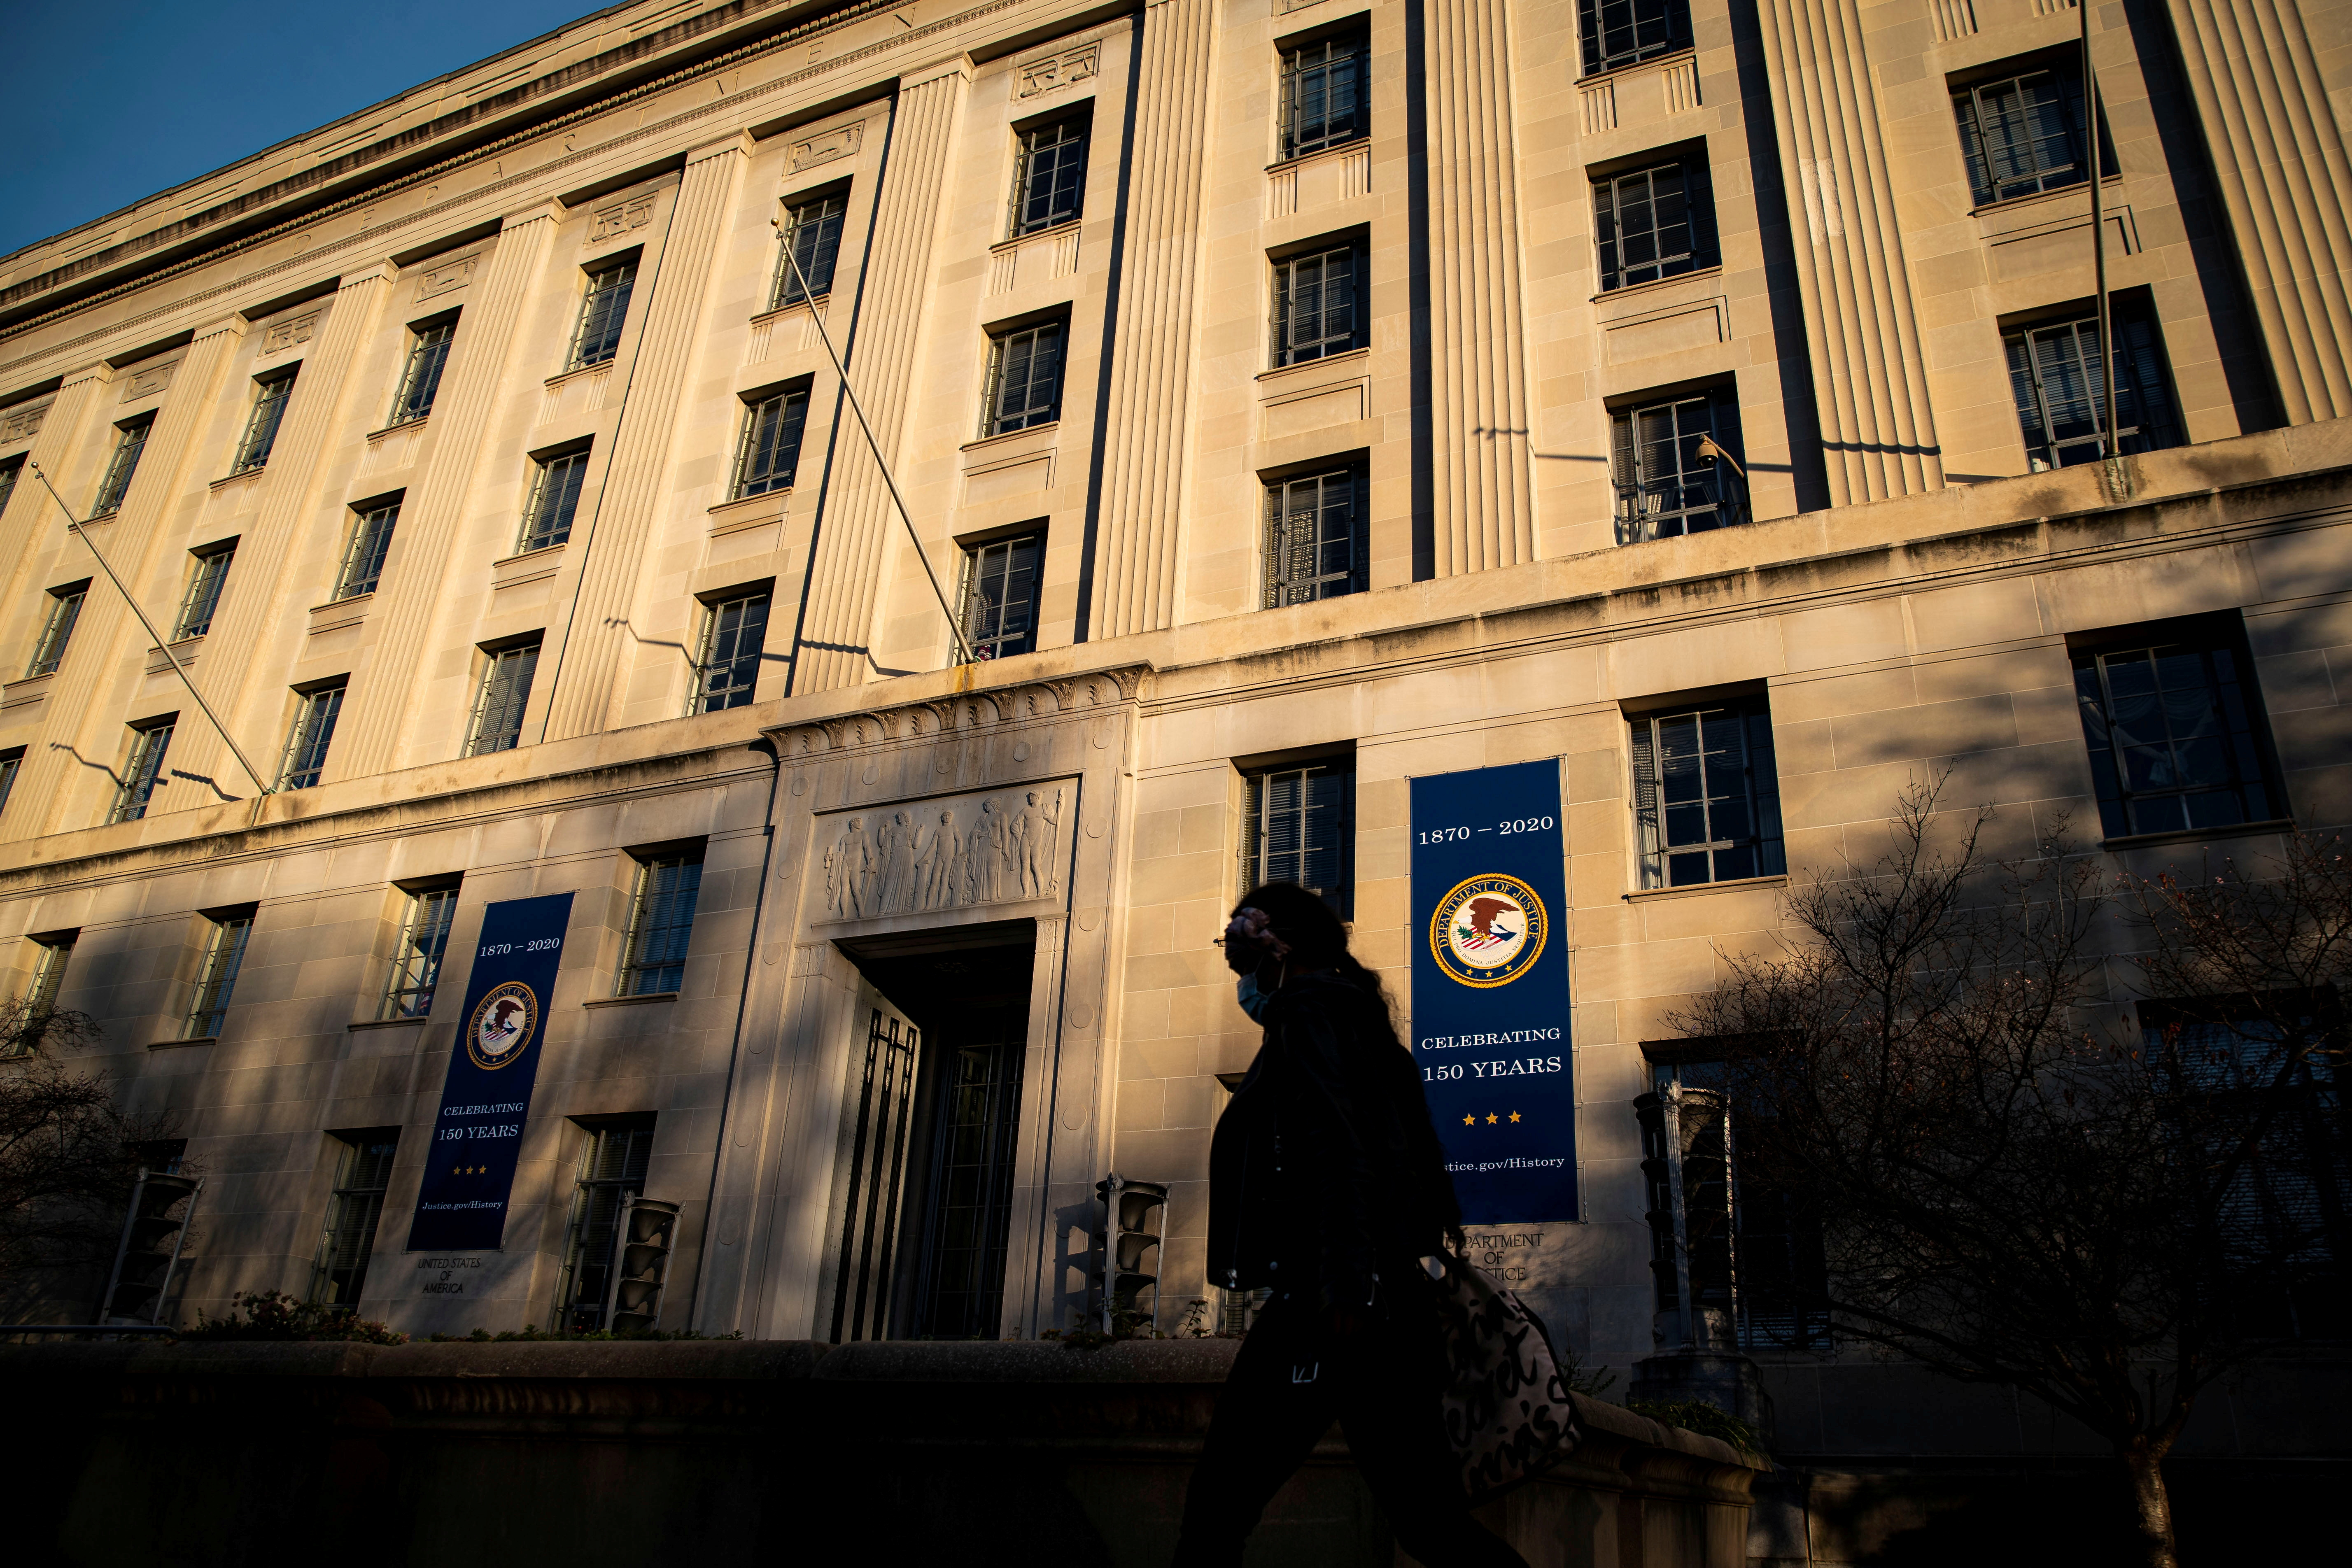 A woman walks past the U.S. Department of Justice Building, in Washington, U.S., December 15, 2020. REUTERS/Al Drago